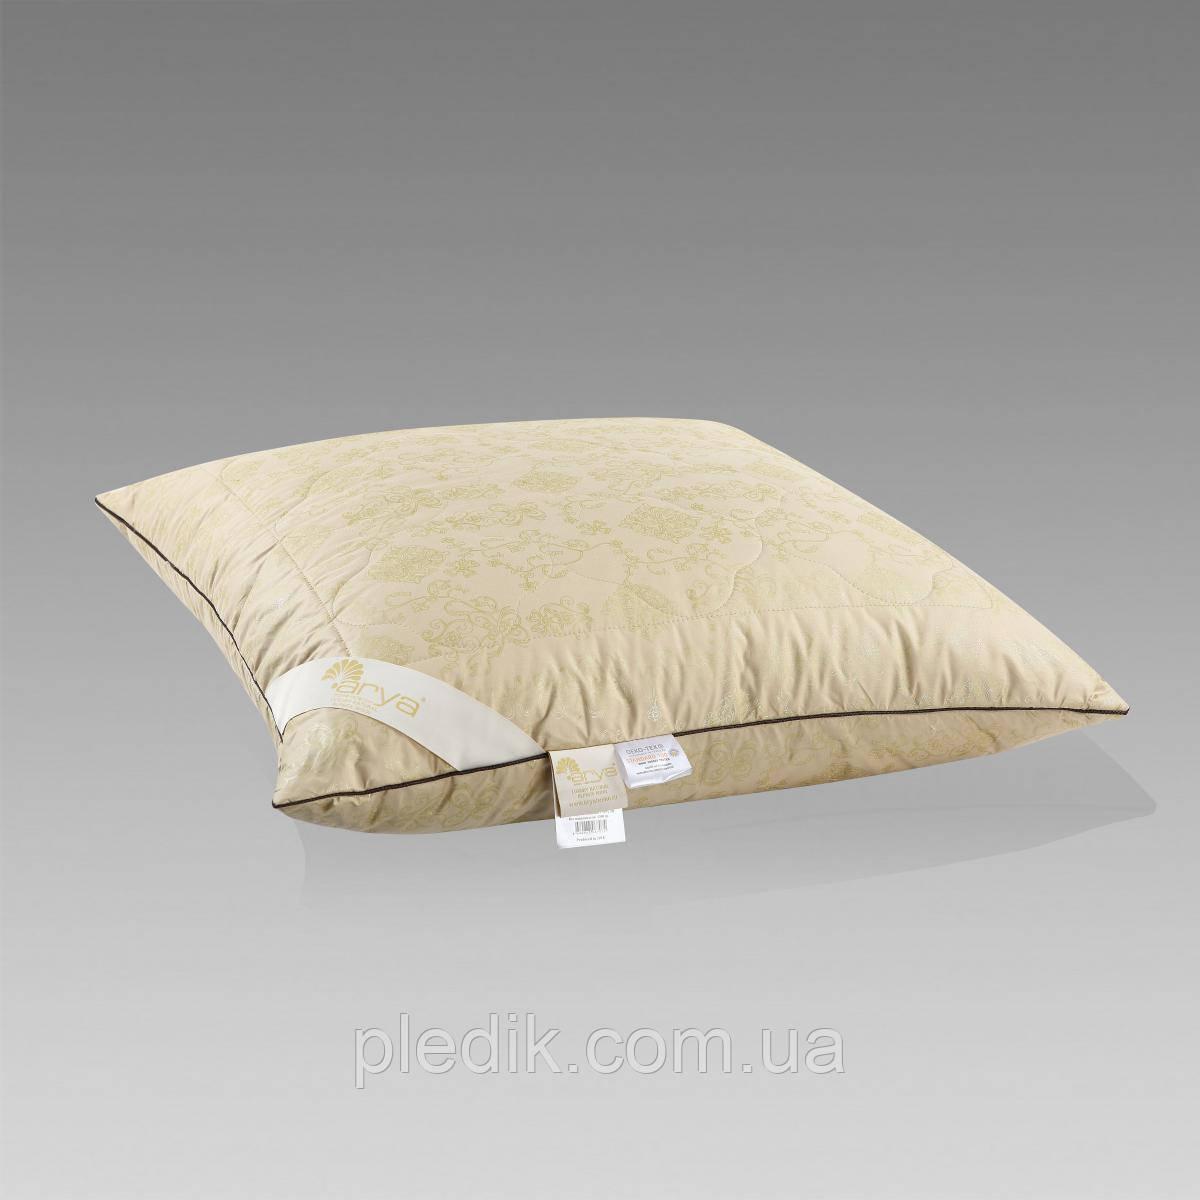 Подушка 70х70 Arya Luxury шерсть Альпака